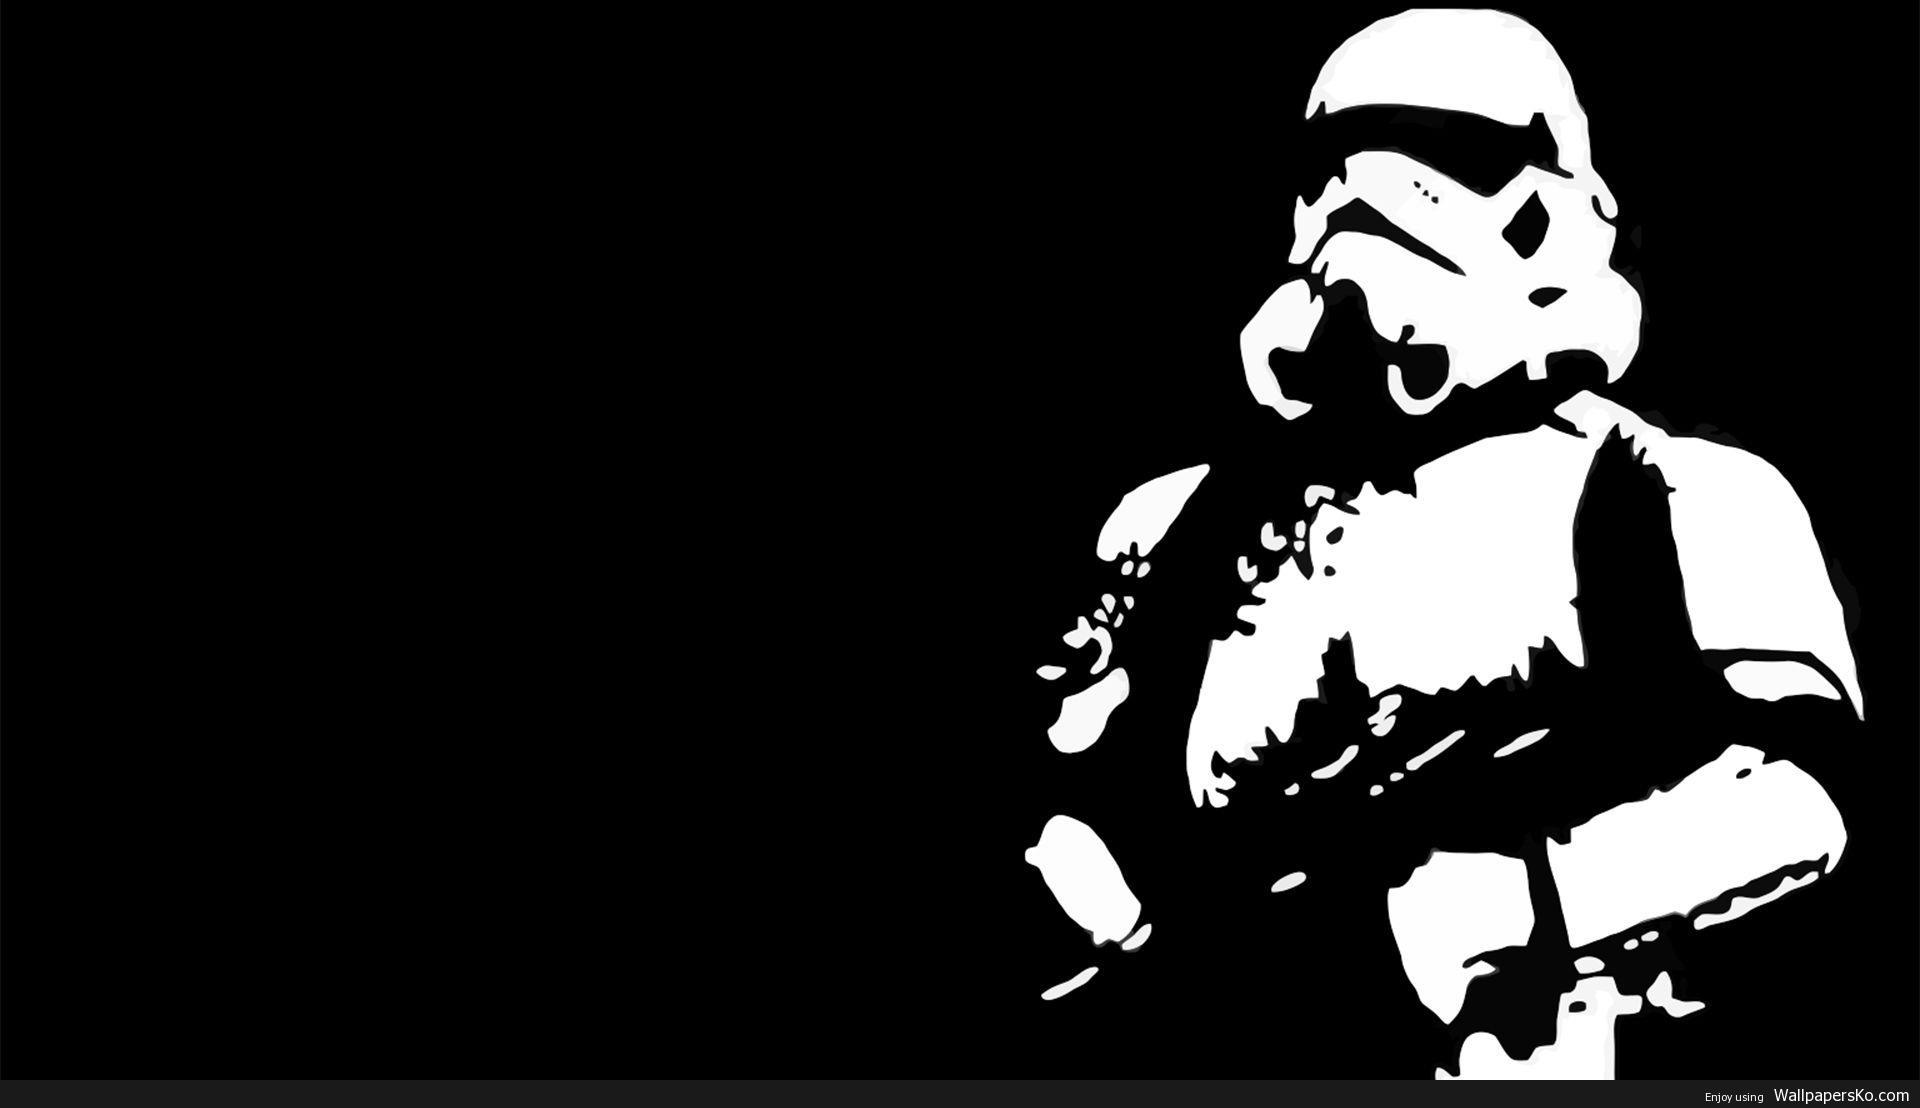 stormtrooper wallpaper : HD Wallpapers